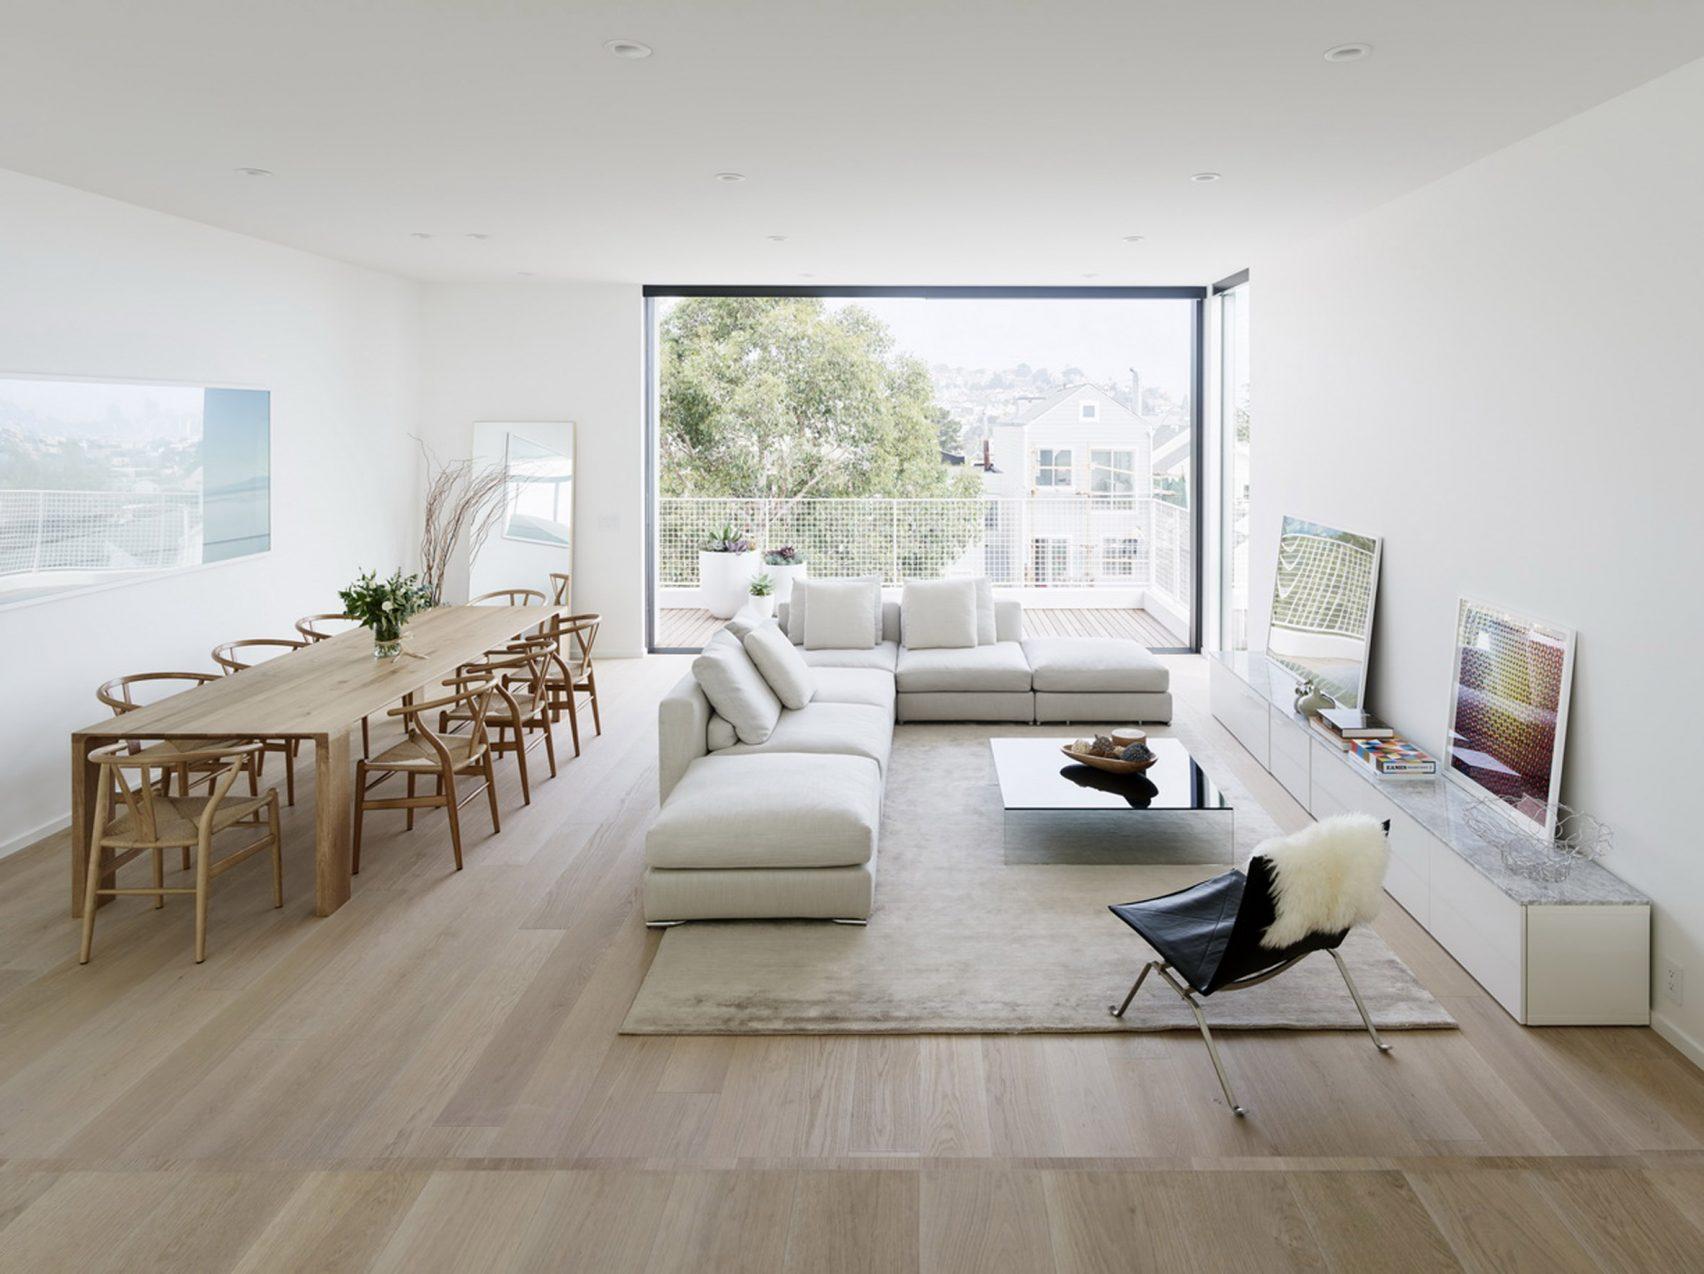 sala-de-estar-e-jantar-luz-natural